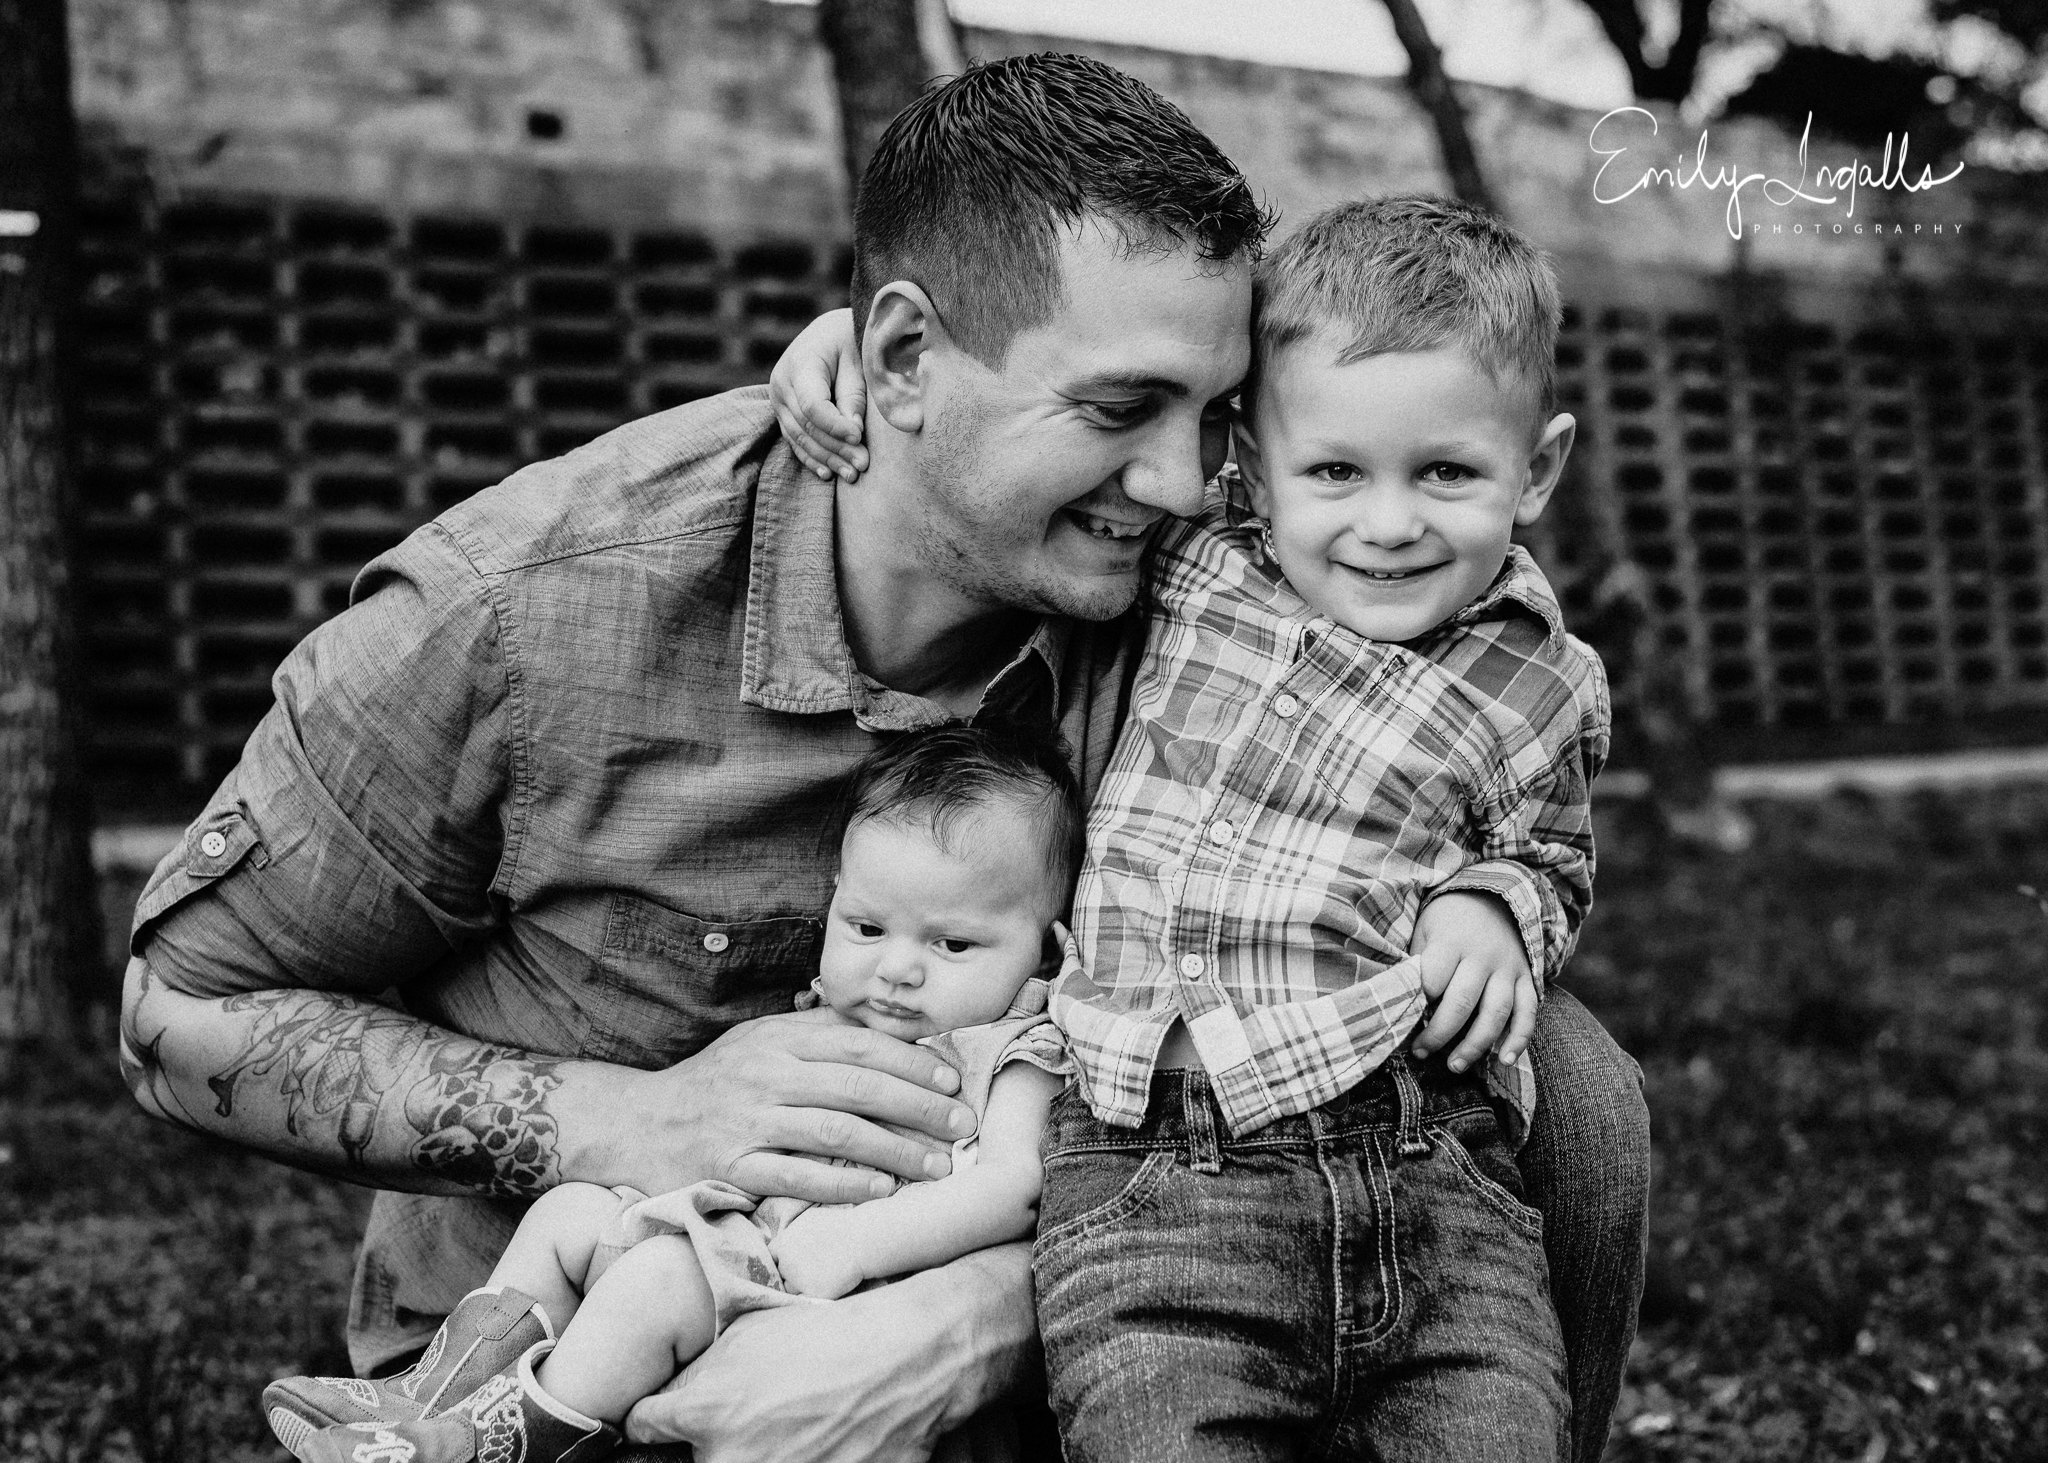 Family Photographer_Round Rock Photographer_Emily Ingalls Photography_Austin Photographer_Pflugerville Photographer_Georgetown Photographer-8.jpg